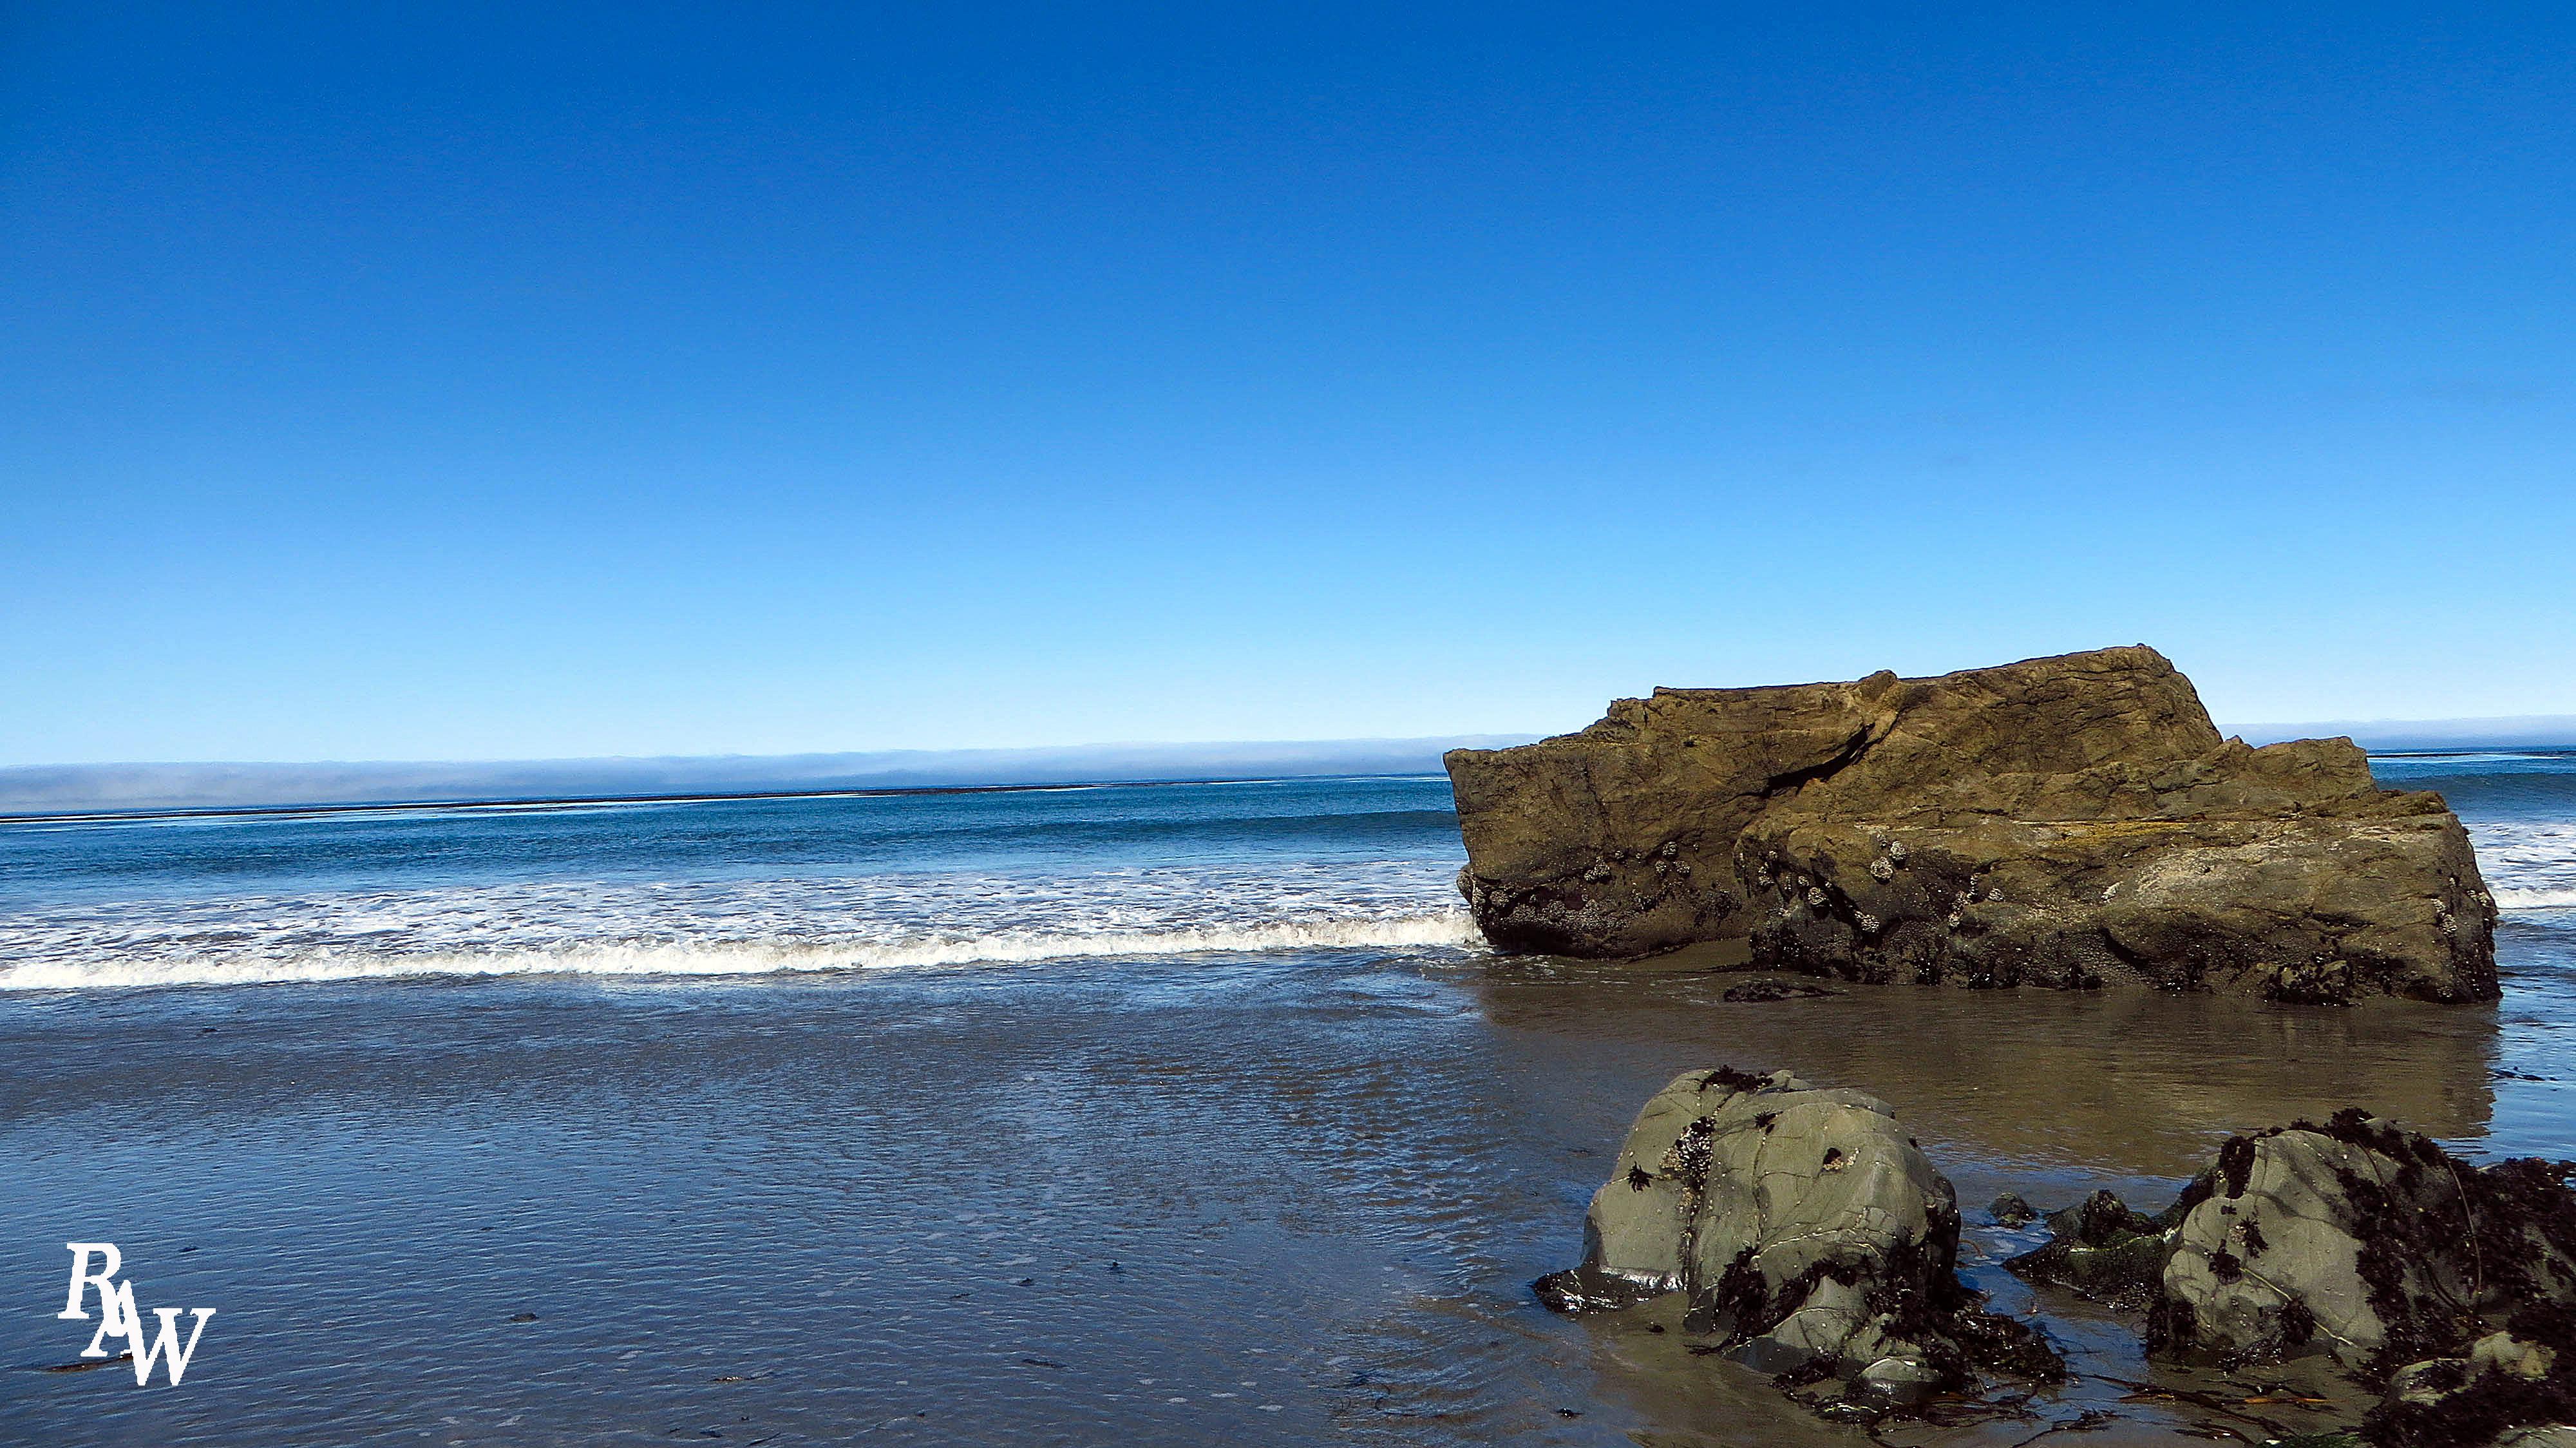 California Beach Landscape Photos